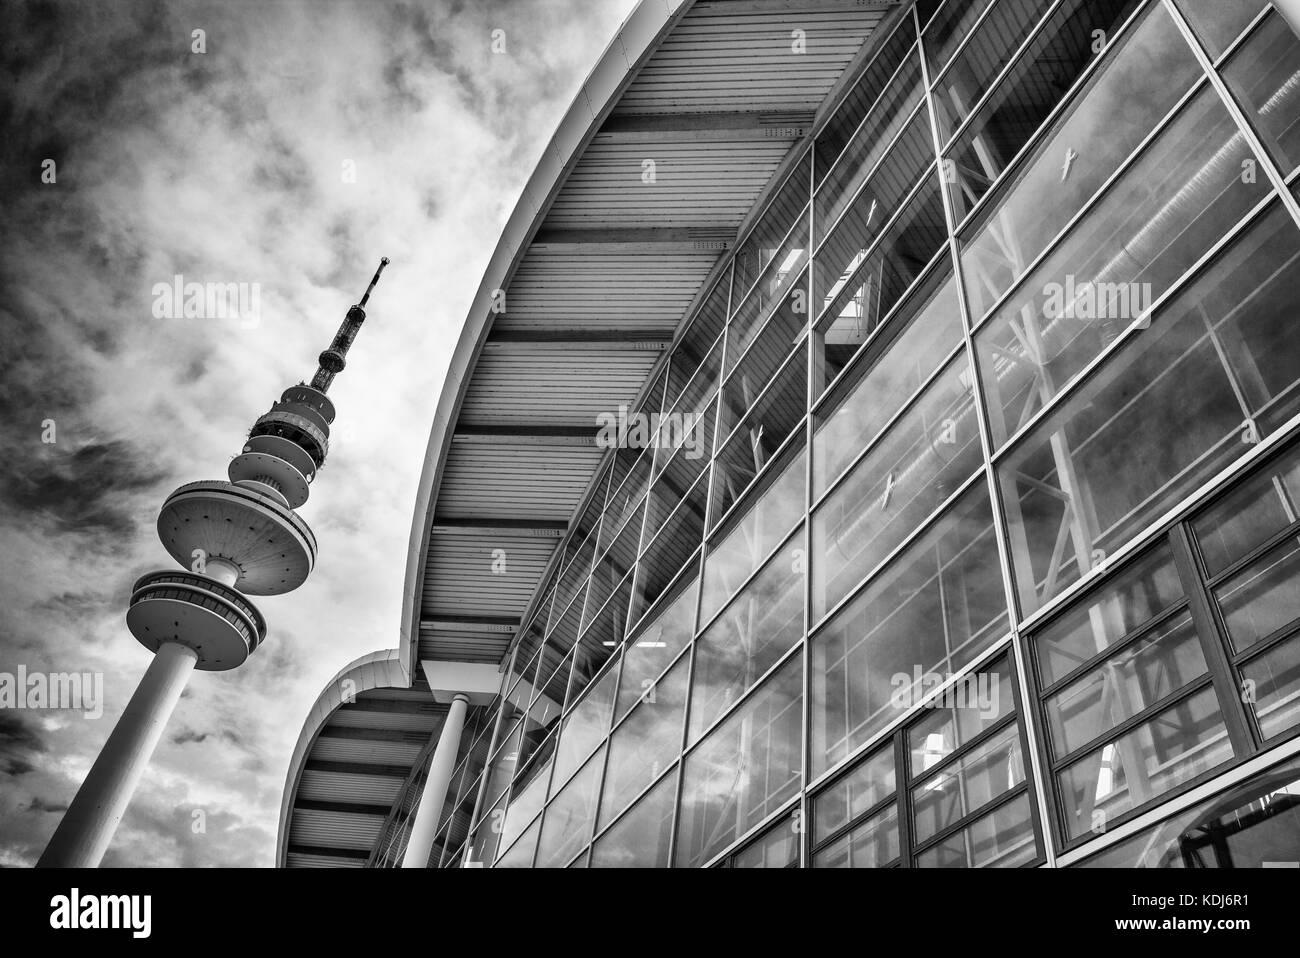 Hamburg Messe und Fernsehturm - Stock Image